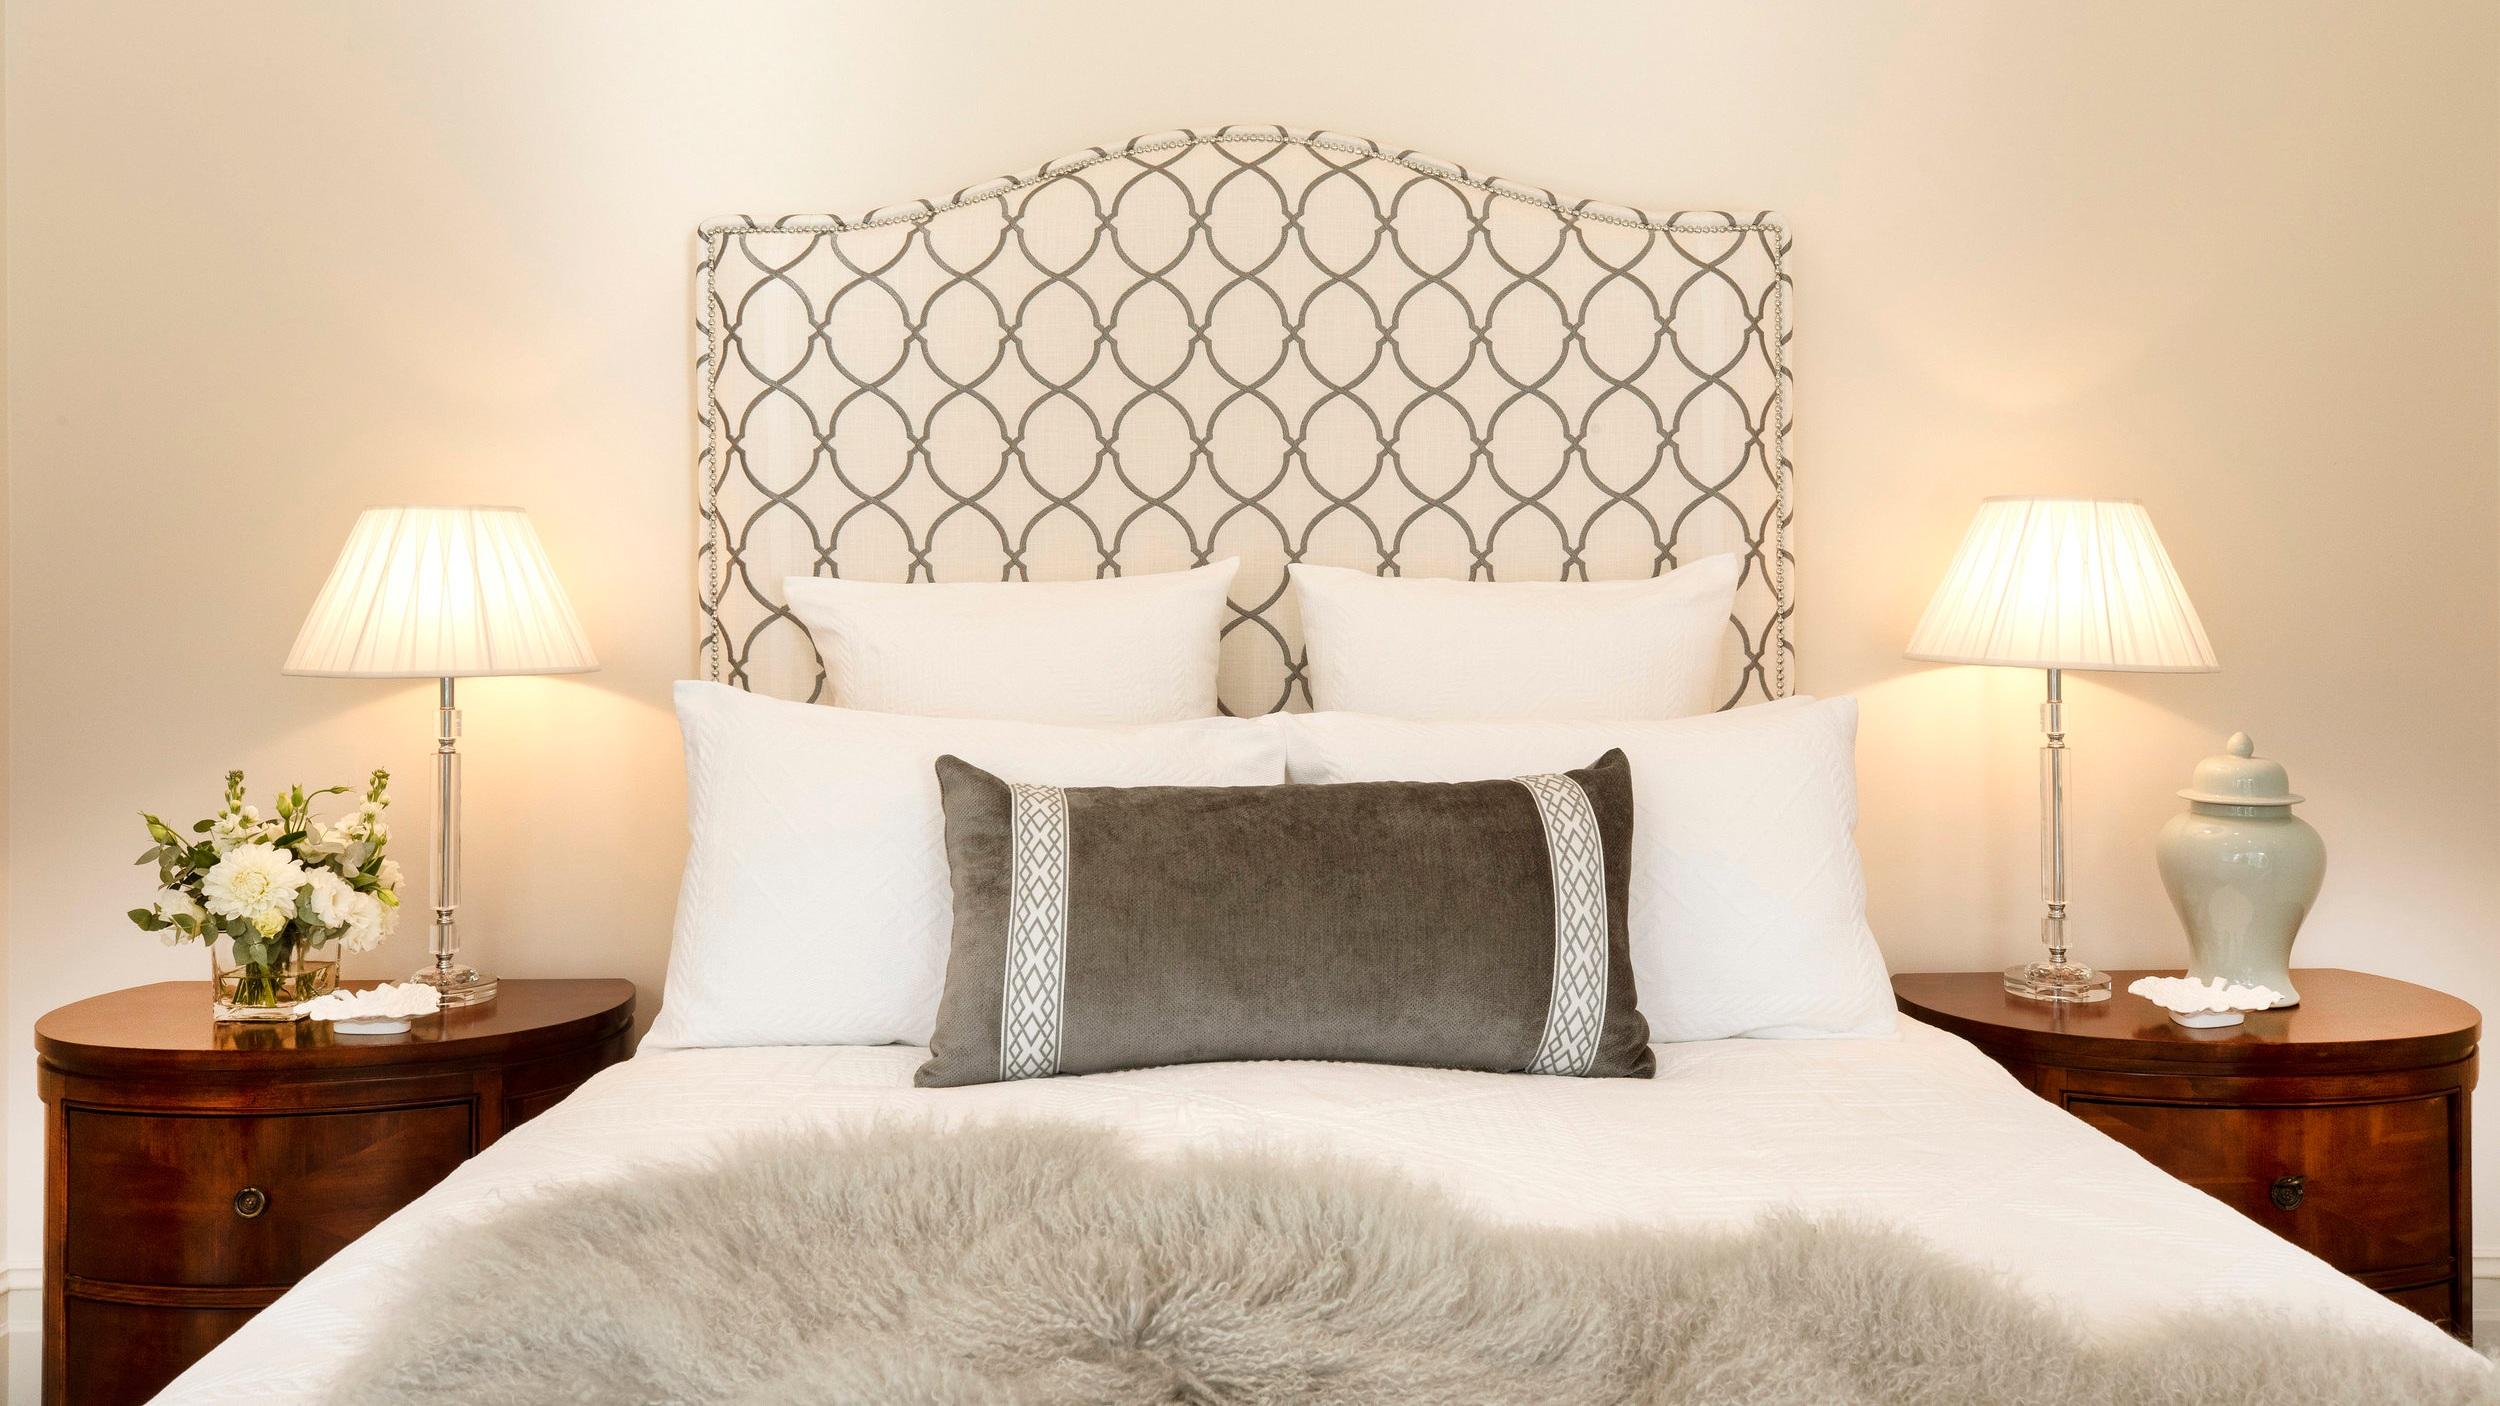 Carrie+Deverson+Interiors_Bedroom+Design_Bedhead.jpg